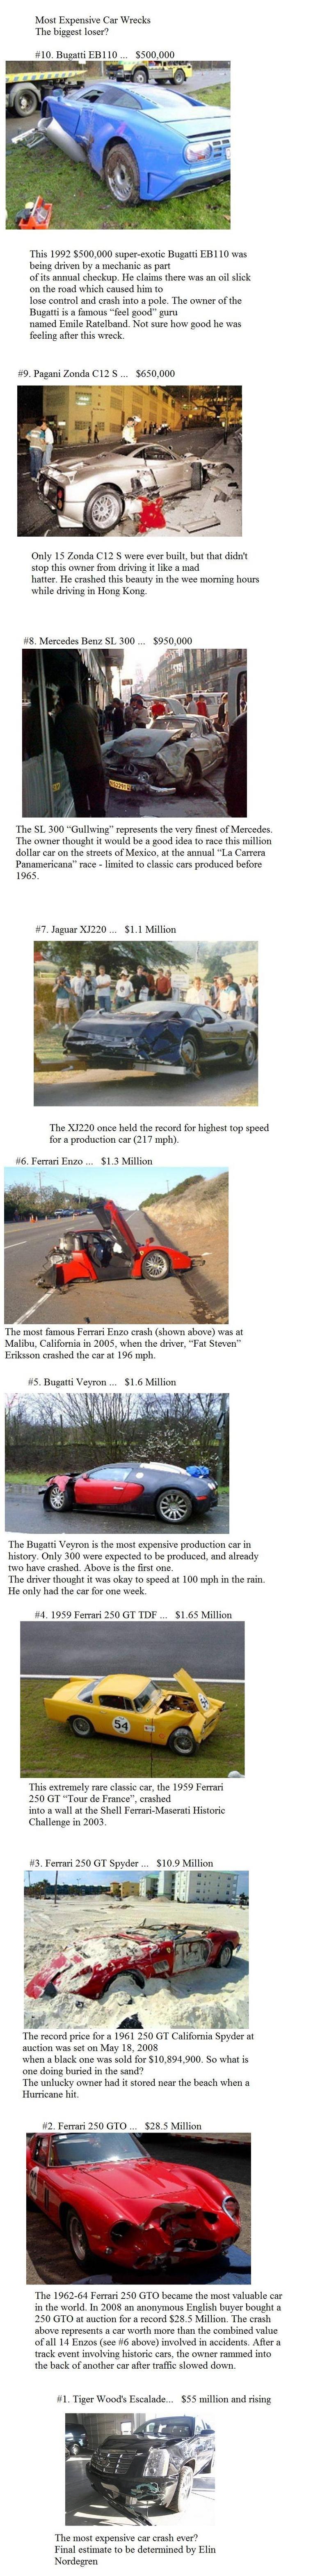 Most expensive car crashes!. most expensive car crashes. Most Expensive Car Wrecks The biggest loser? 10. Bugatti EBI 10 , 000 This 1992 , 000 Bugatti EBI 10 wa gweenie Cars crashes